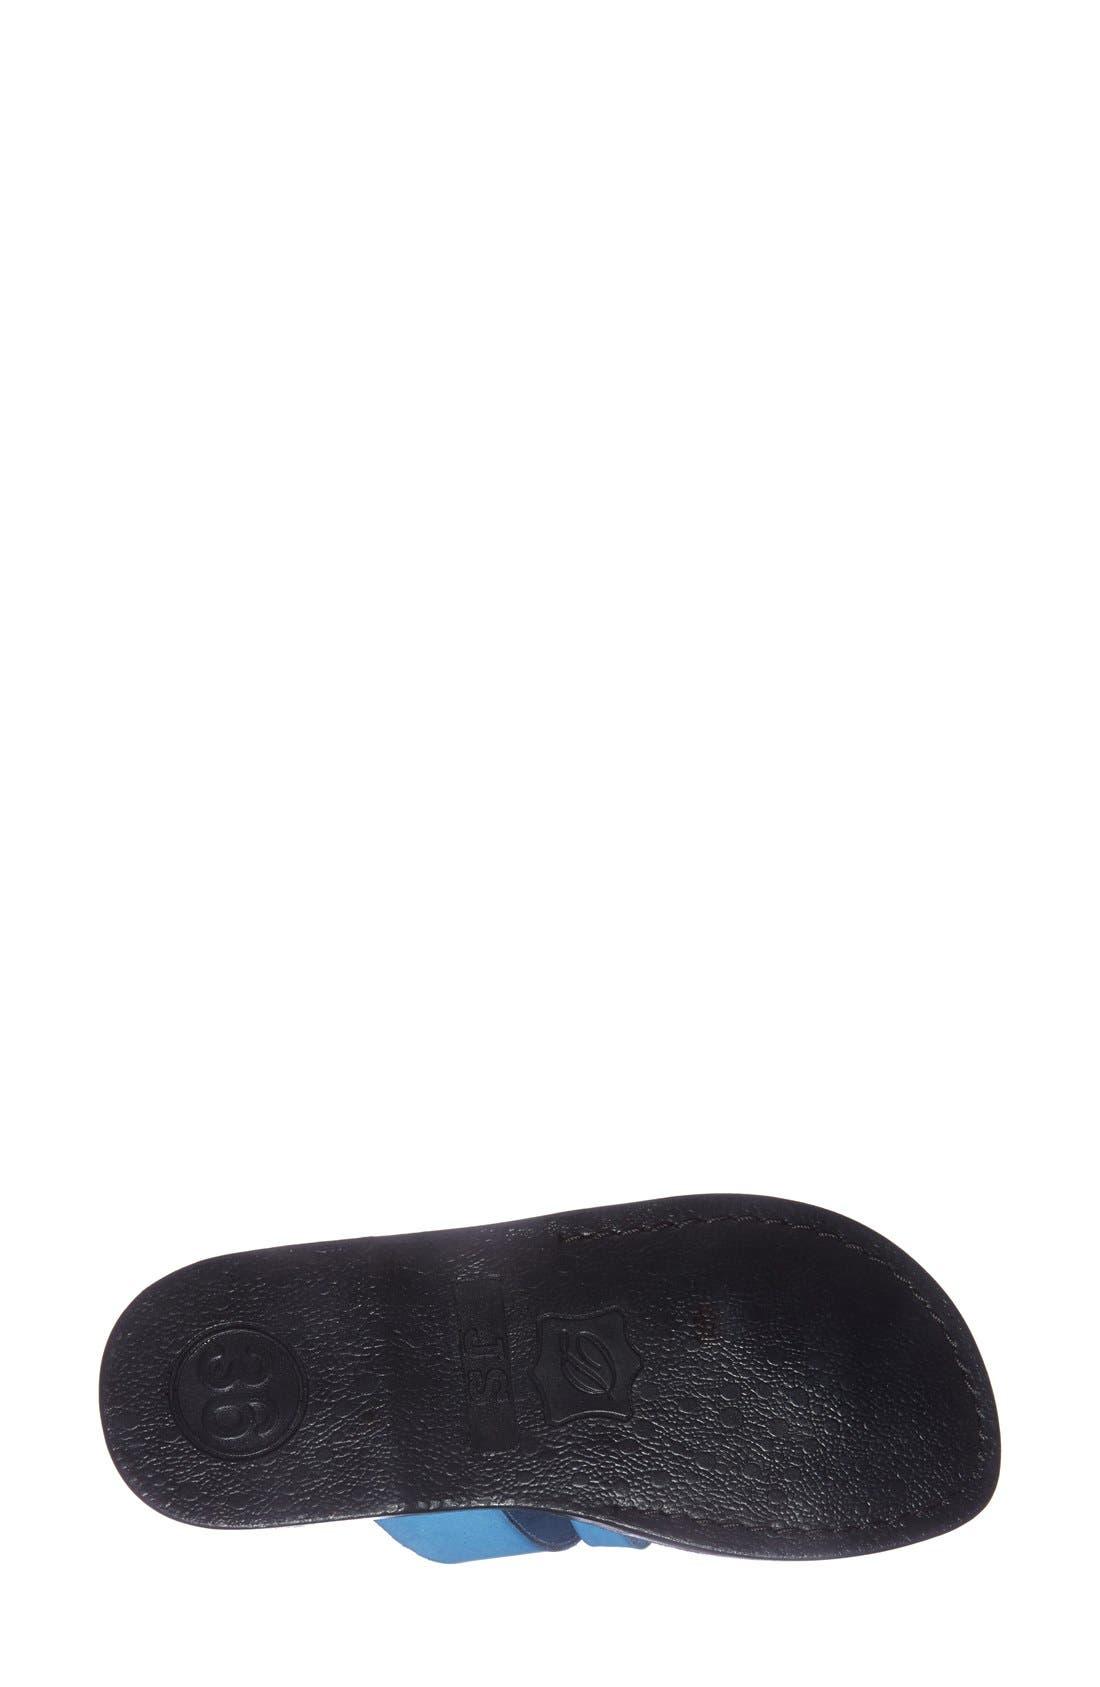 'The Good Shepard' Leather Sandal,                             Alternate thumbnail 30, color,